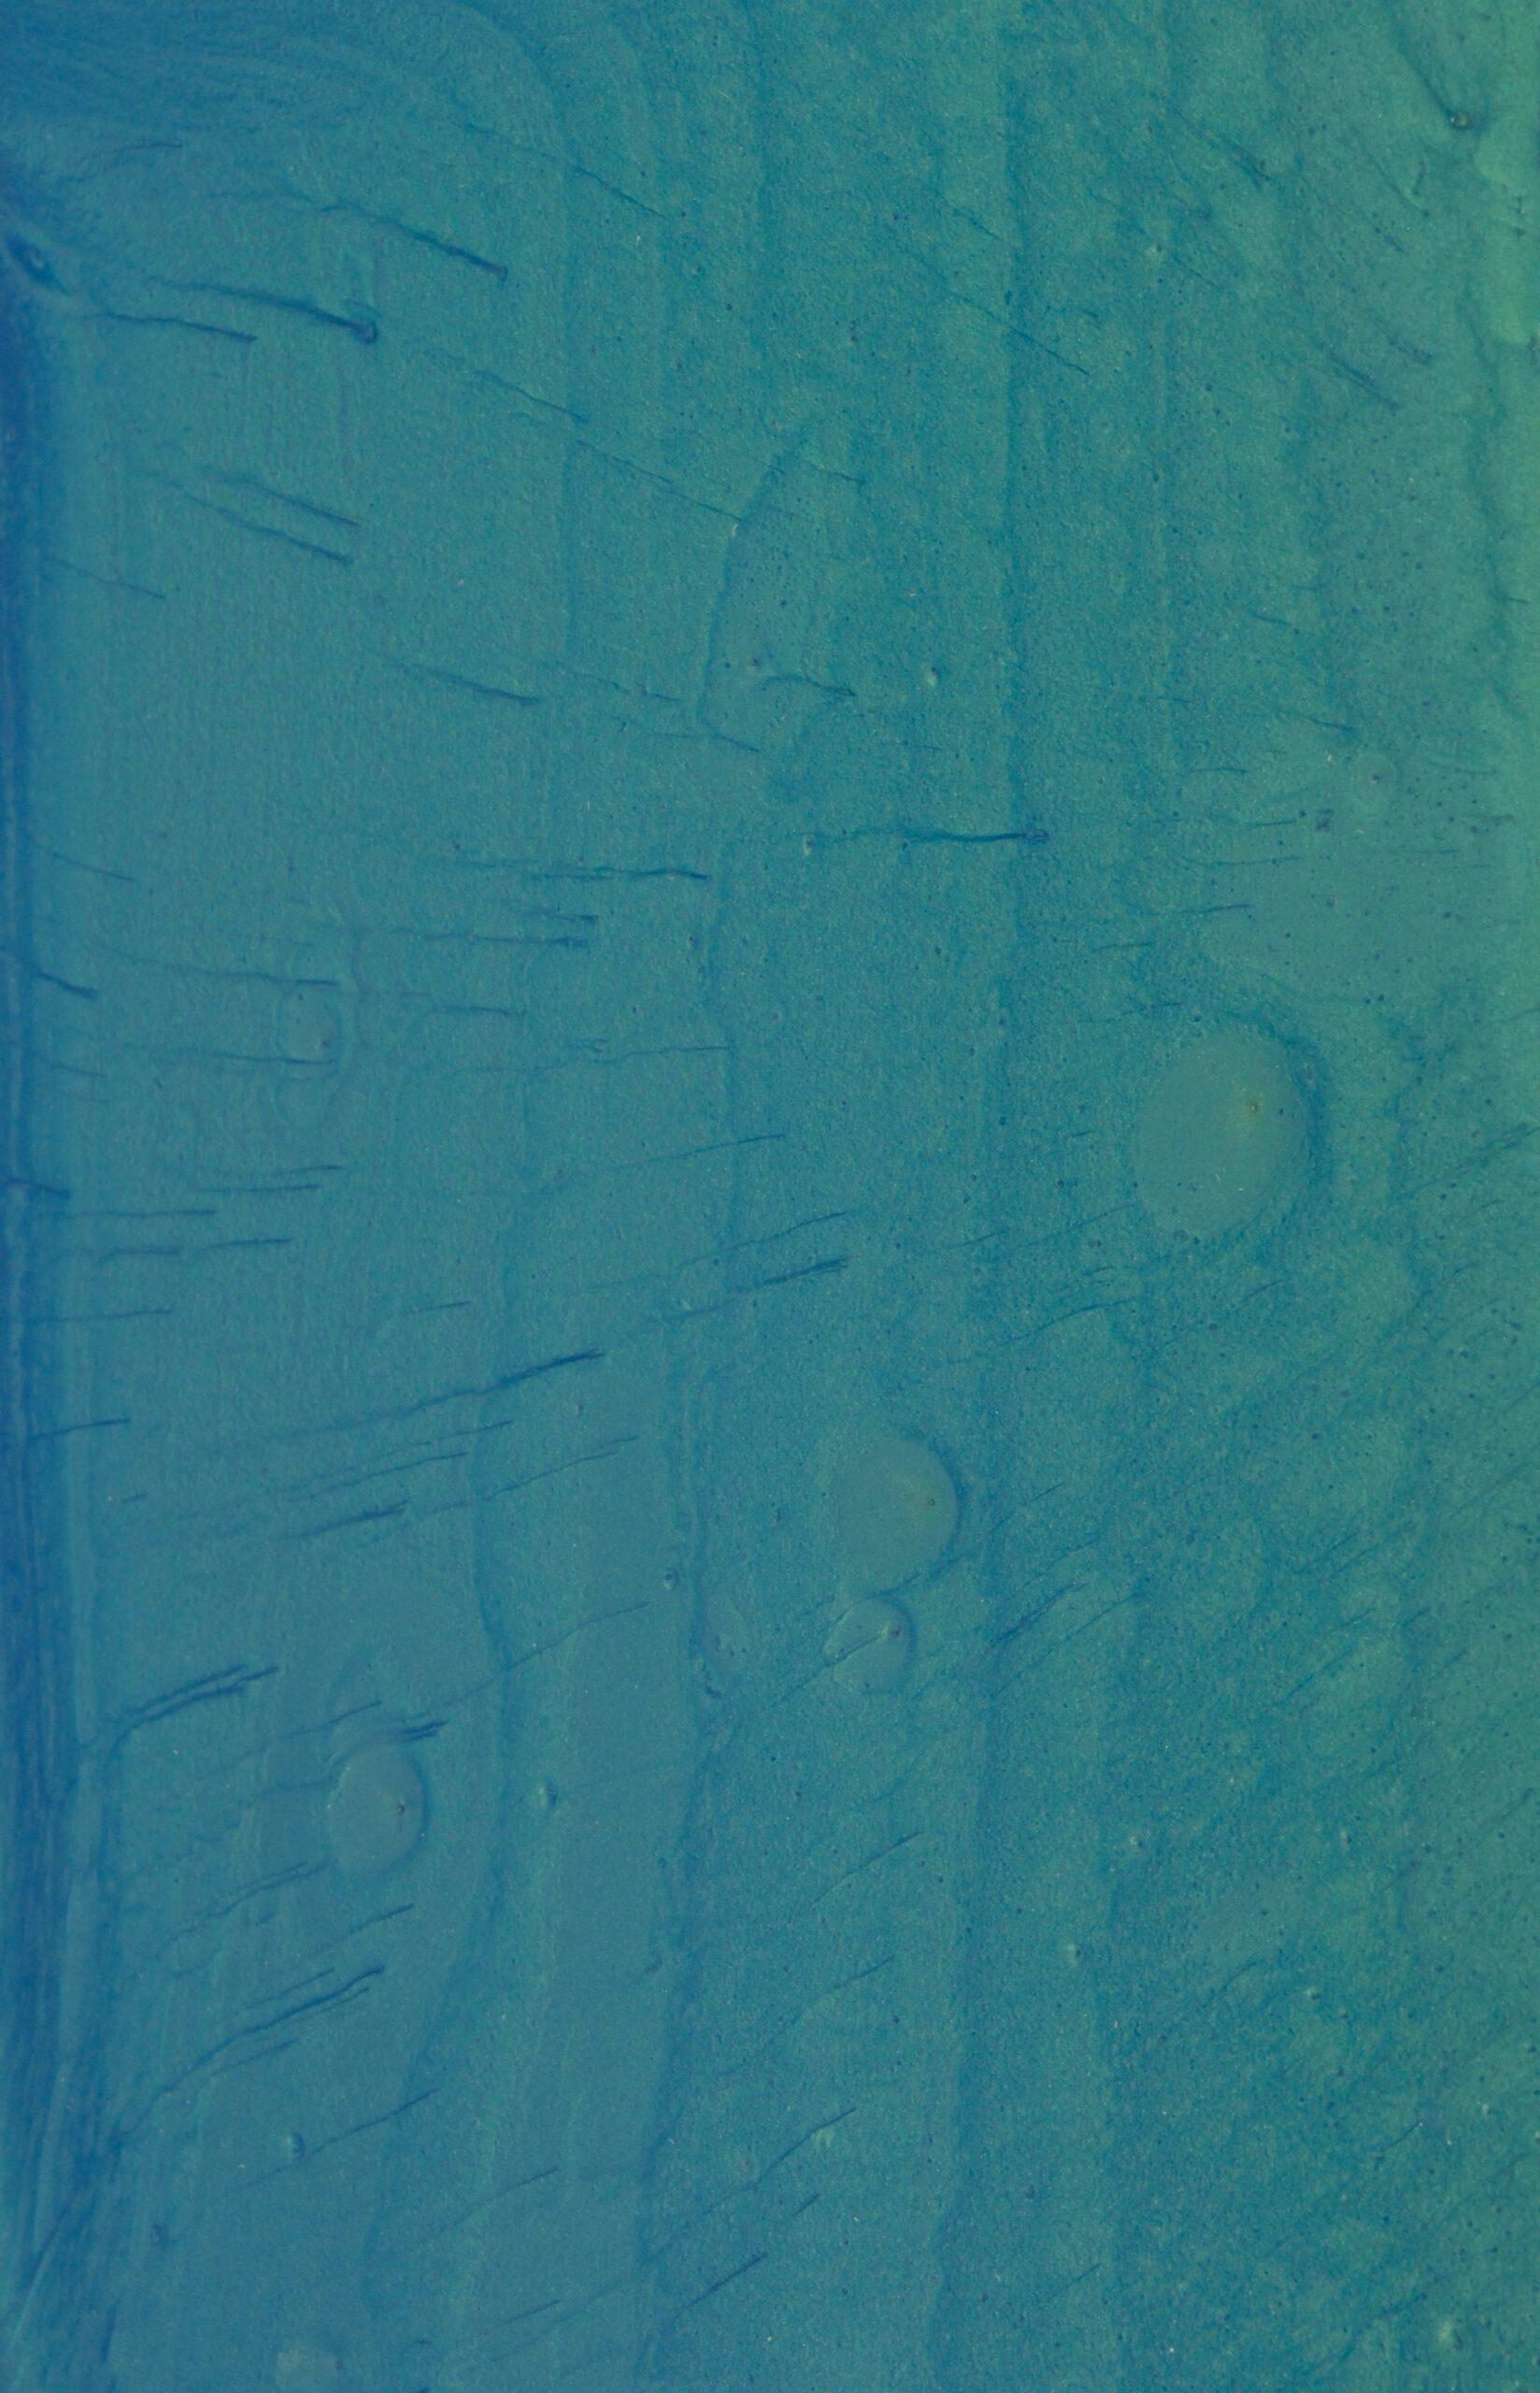 Gold Blue Metallic Farvepigment